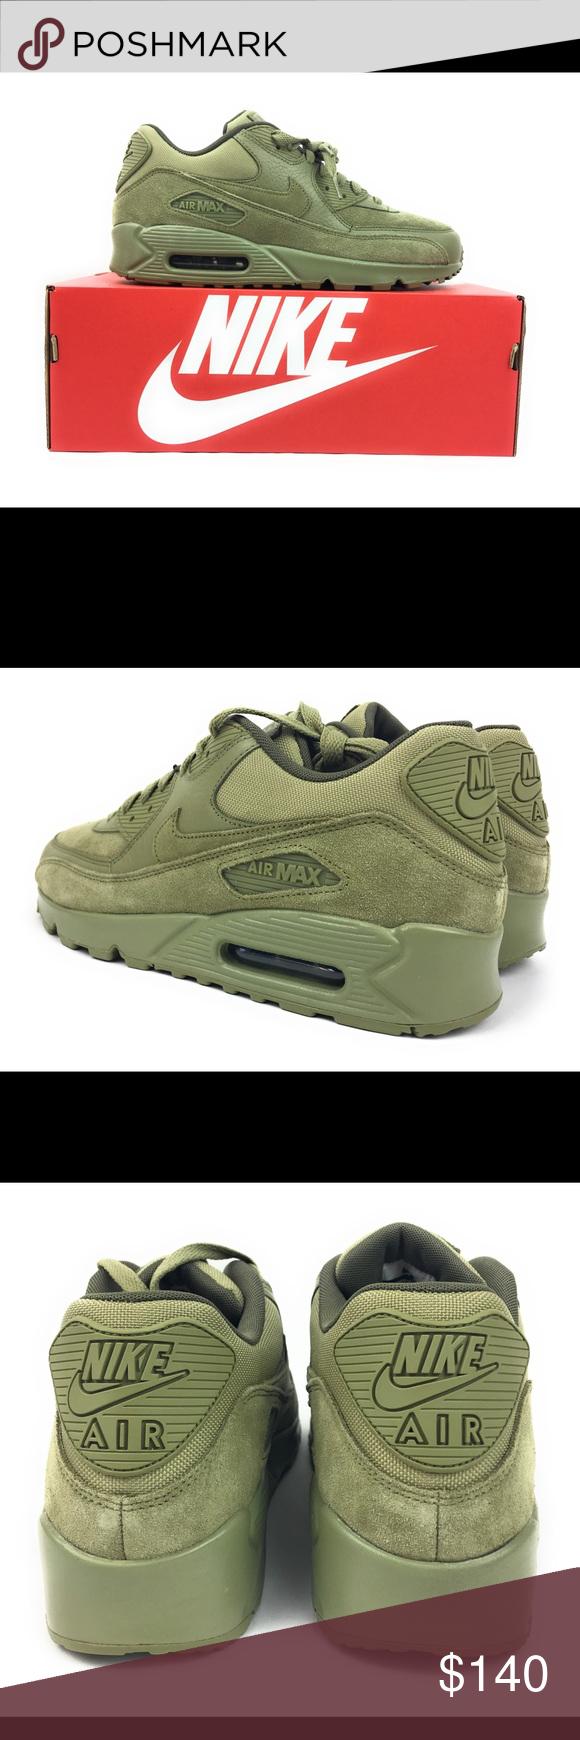 42 Herren Nike Air Max 90 Premium Neutral Olive 700155 im